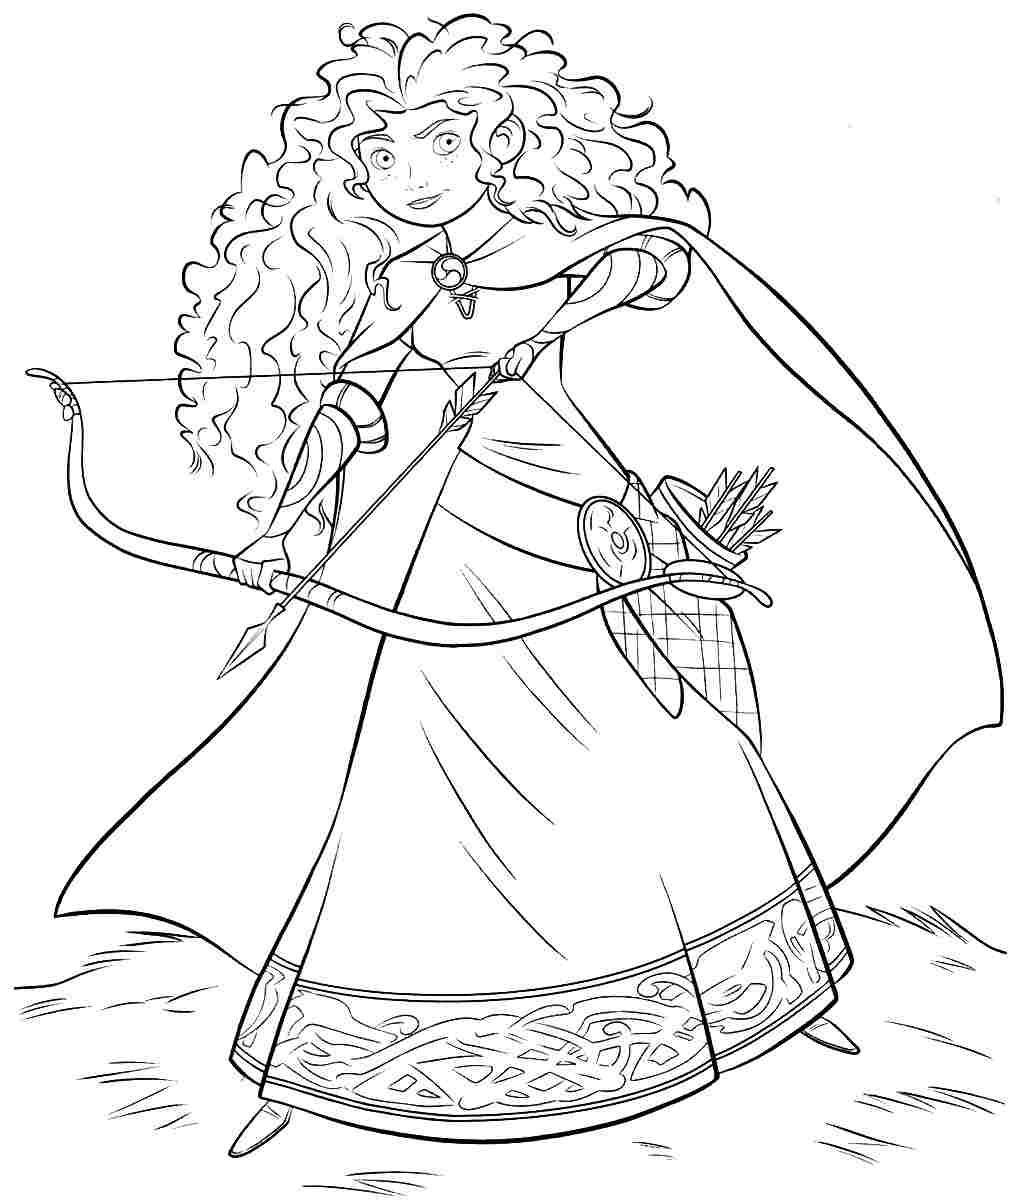 Free Disney Brave Coloring Pages Printabel | colouring pages disney princesses printable